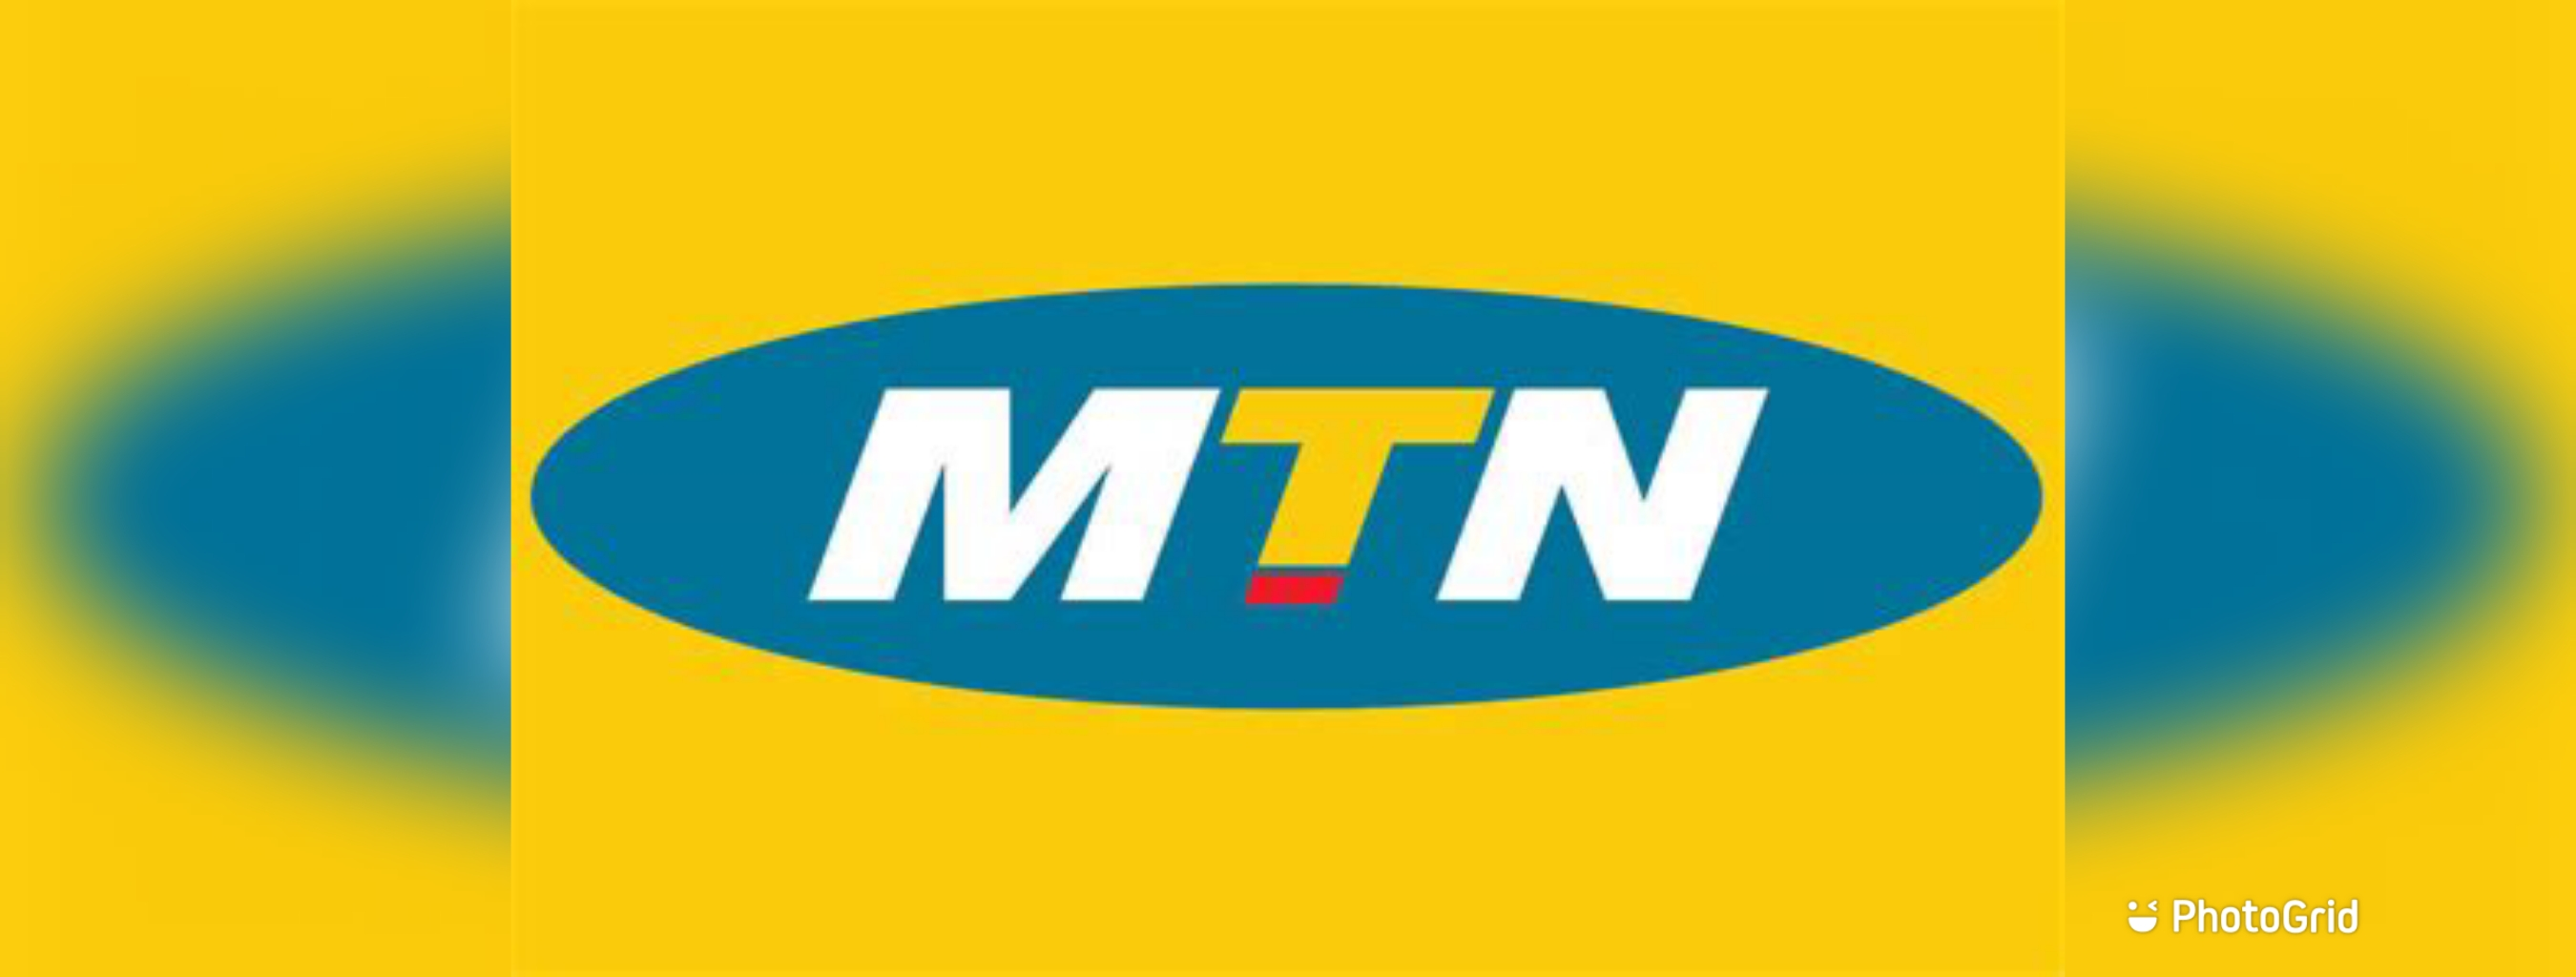 MTN GH logo 2021-2022